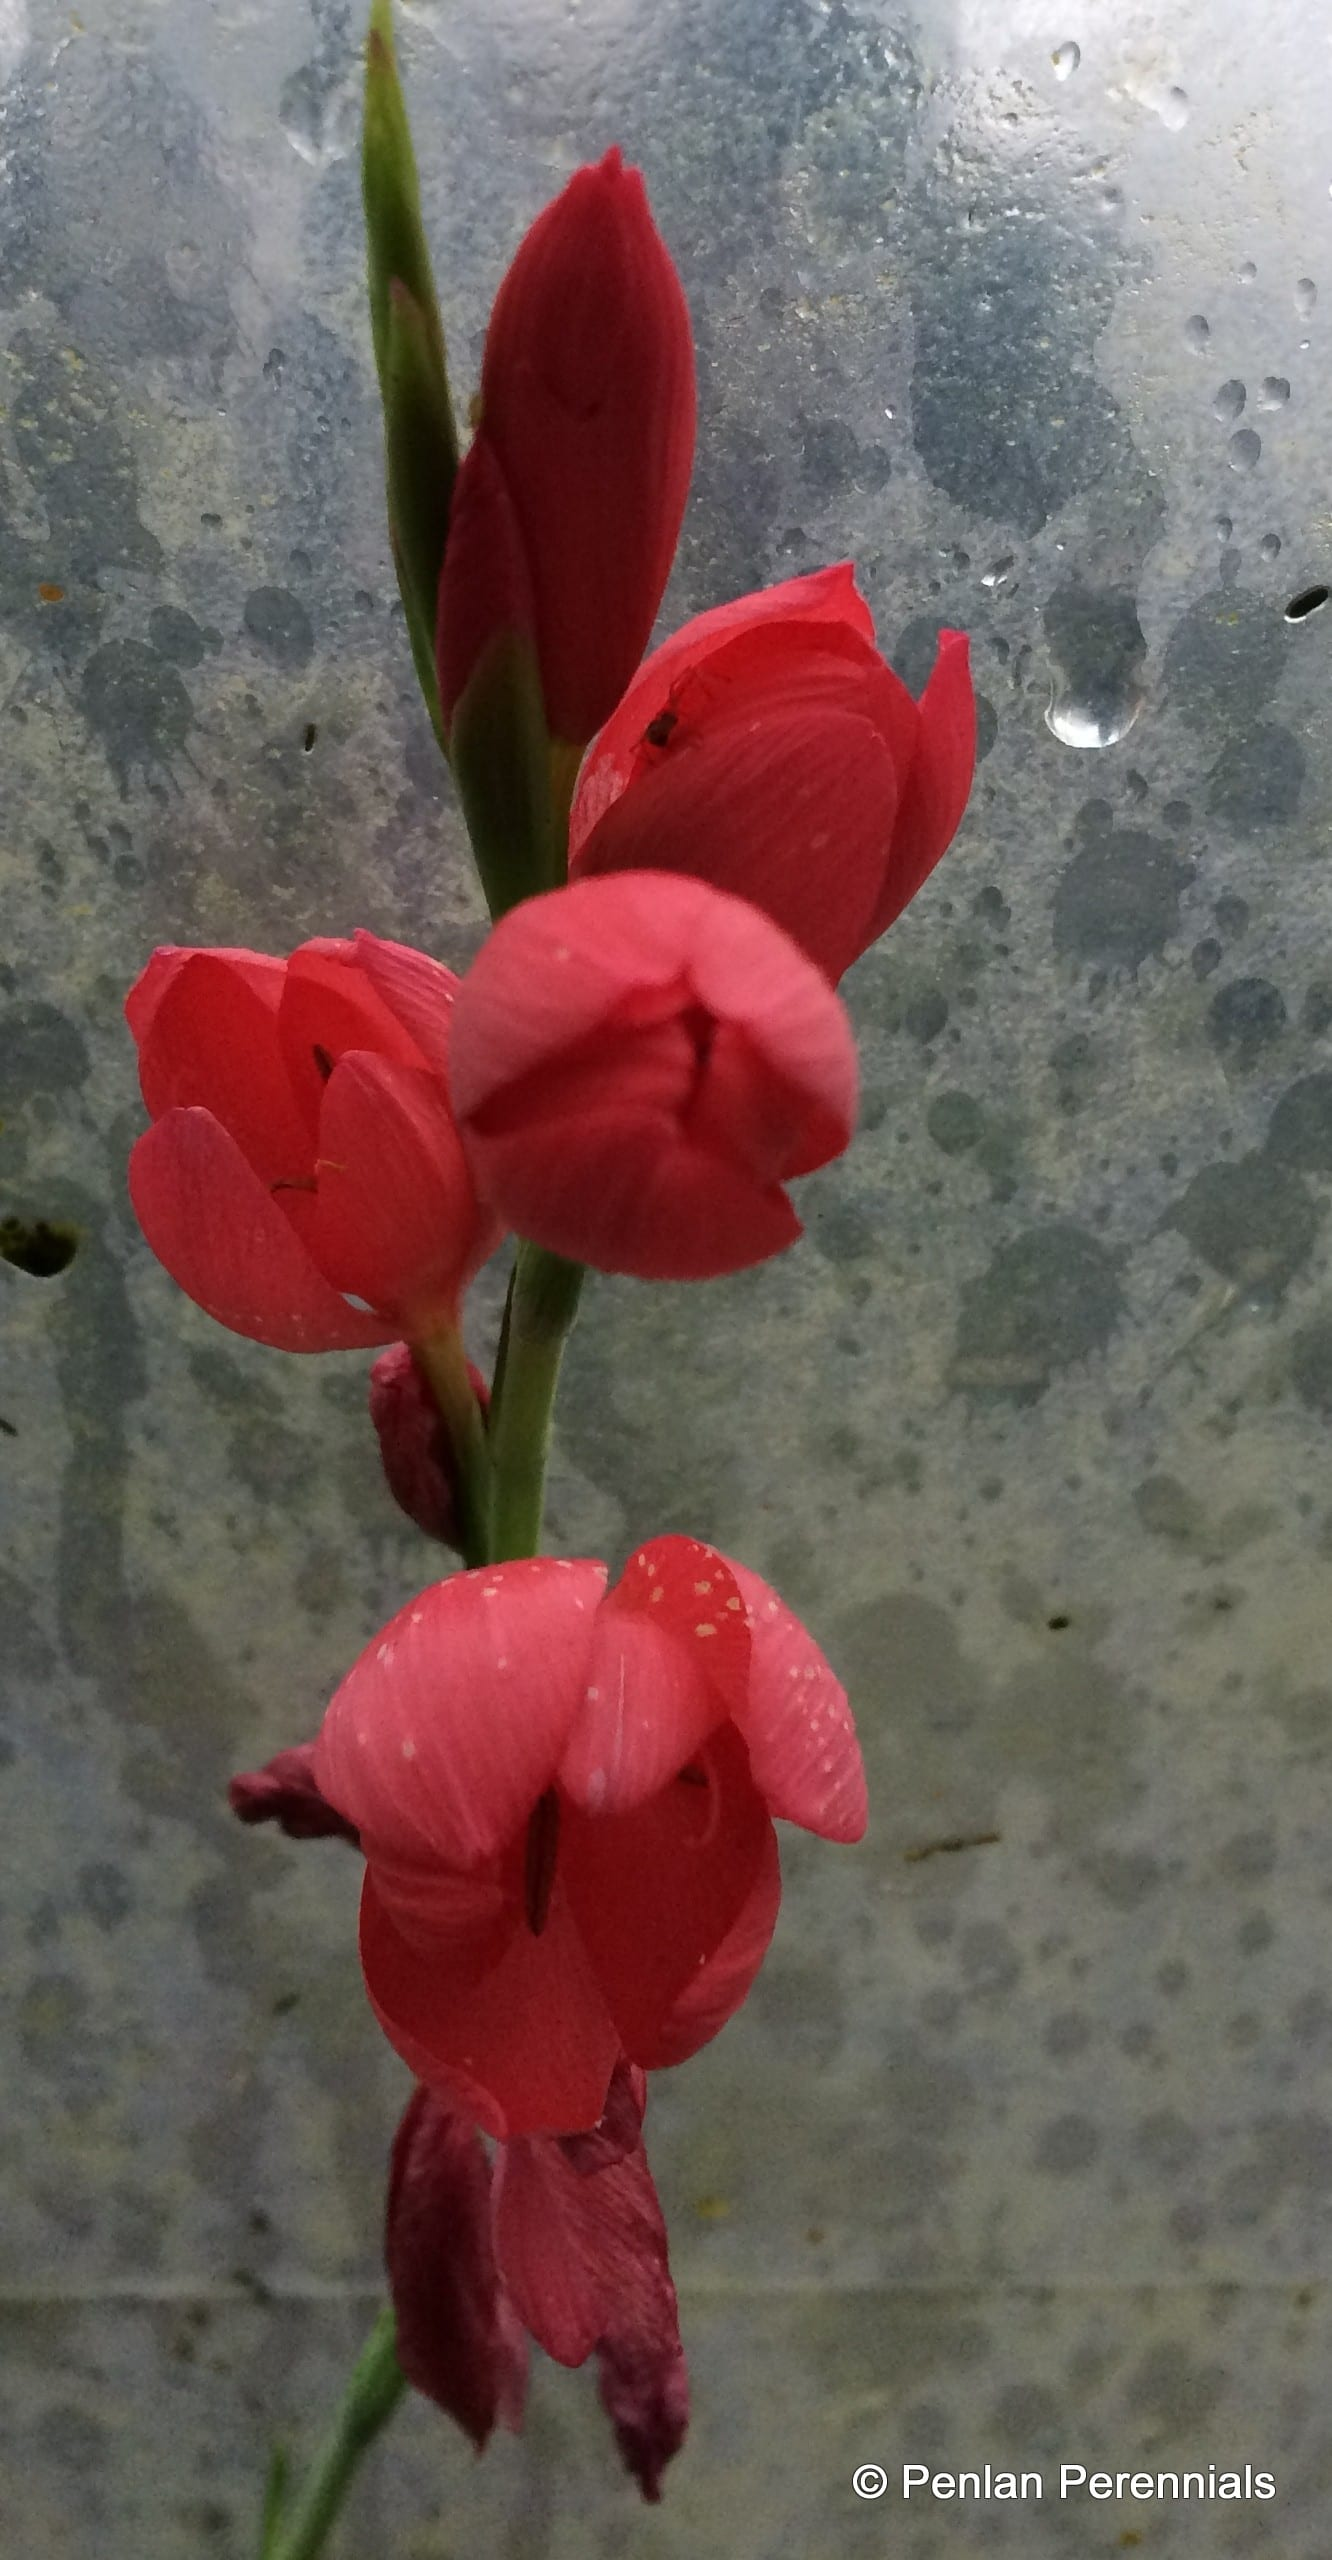 Penlan Perennials Nursery: Hesperantha Coccinea 'Major'